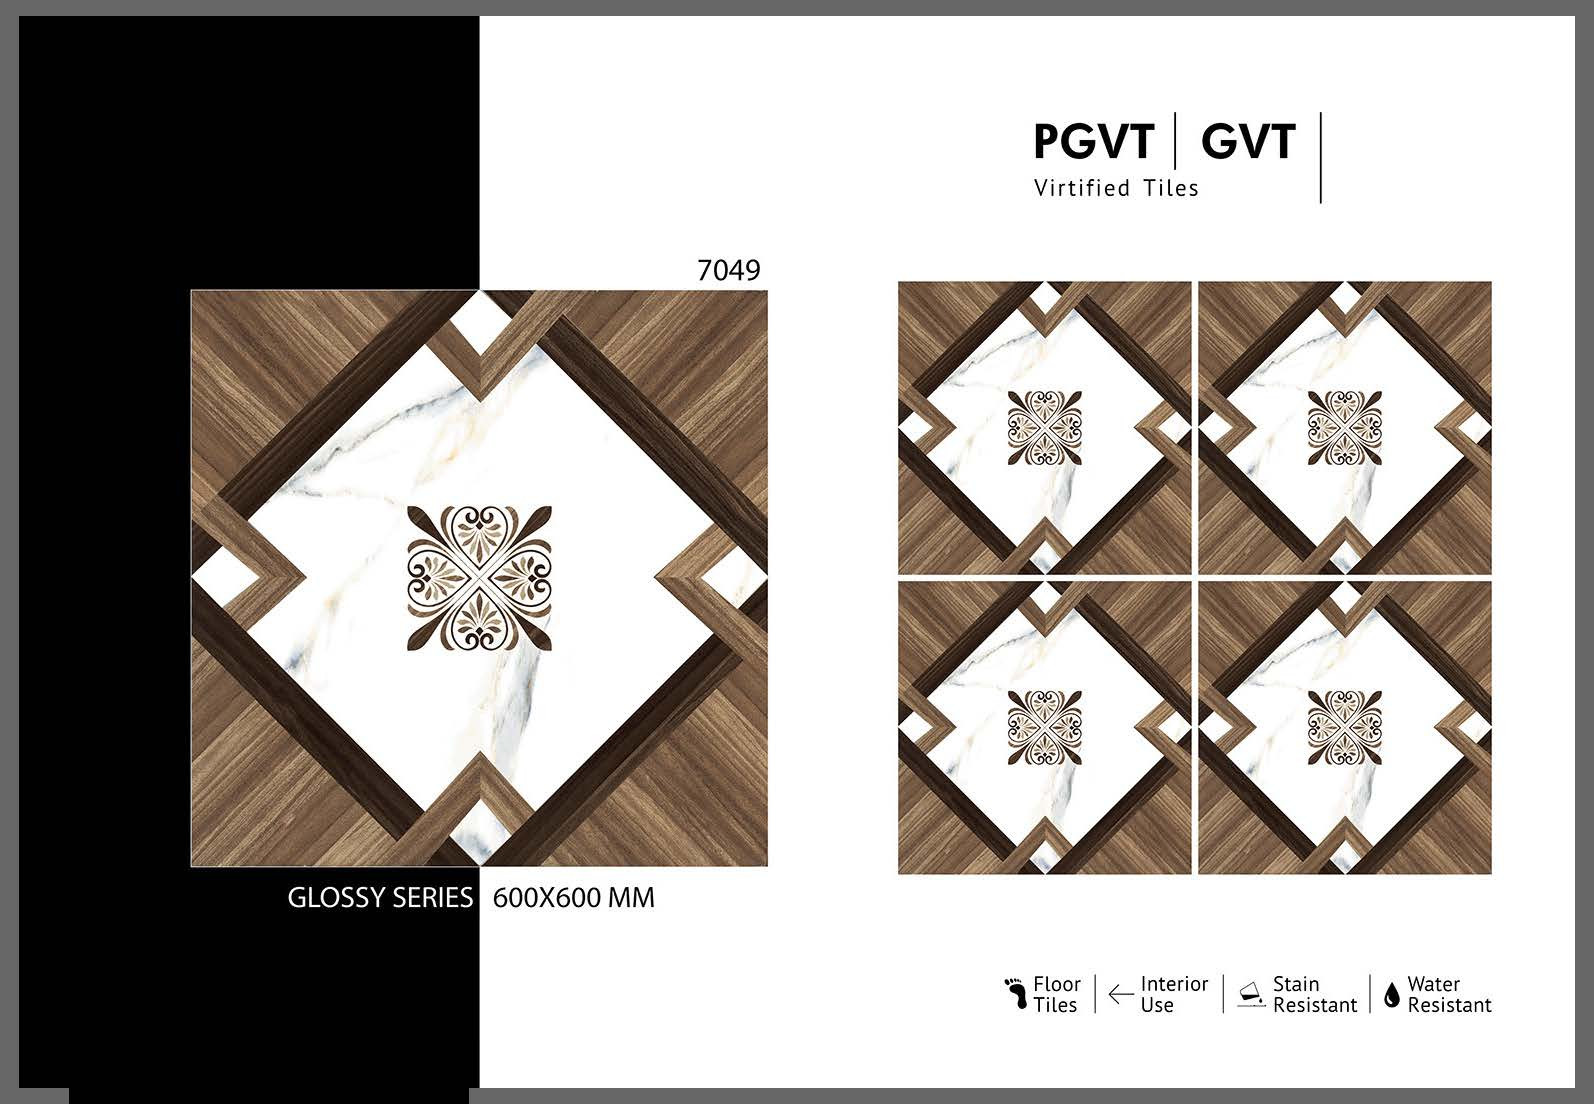 GVT 2X2 GLOSSY_Page_37.jpg